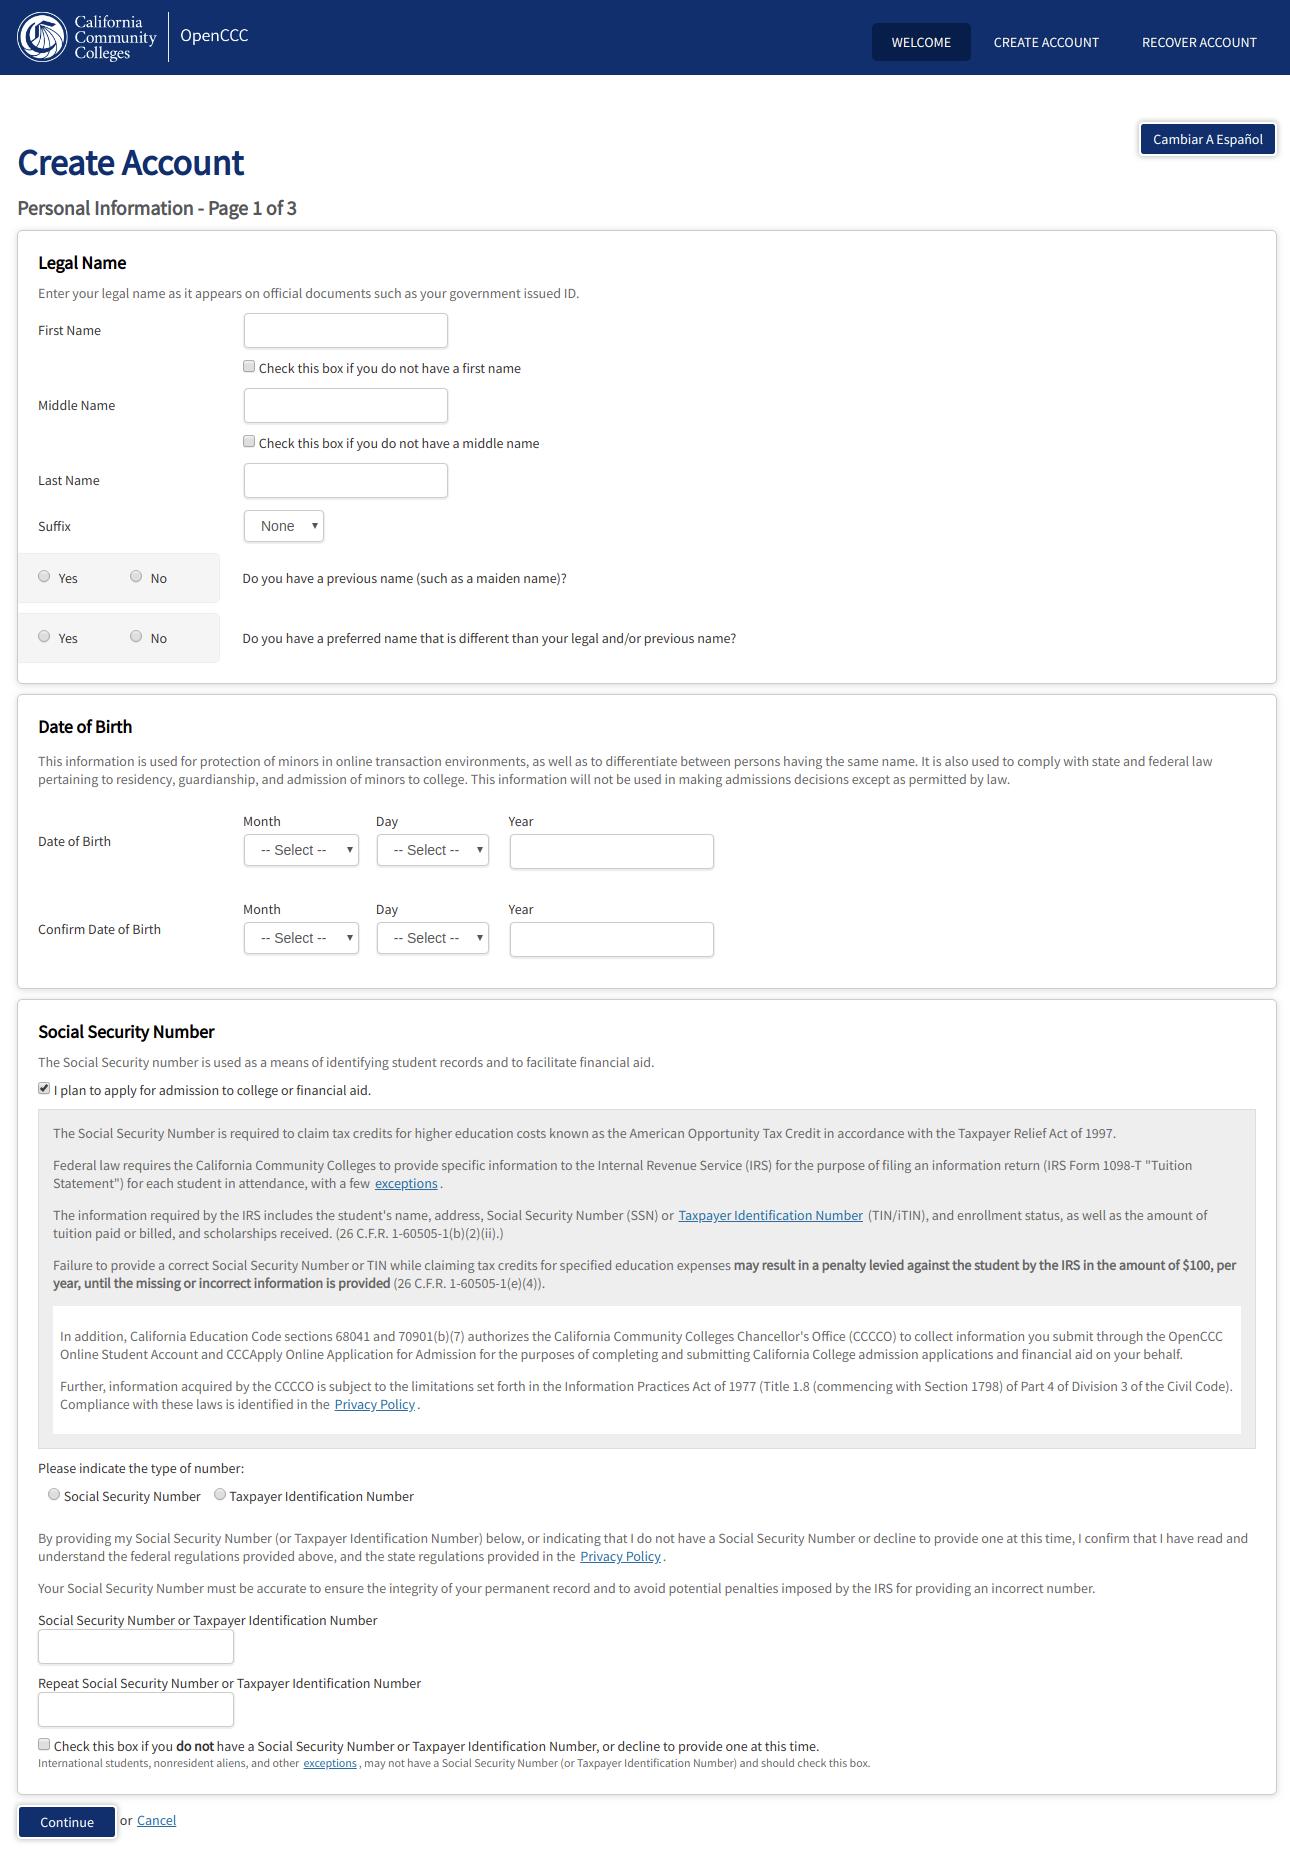 OpenCCC Create Account